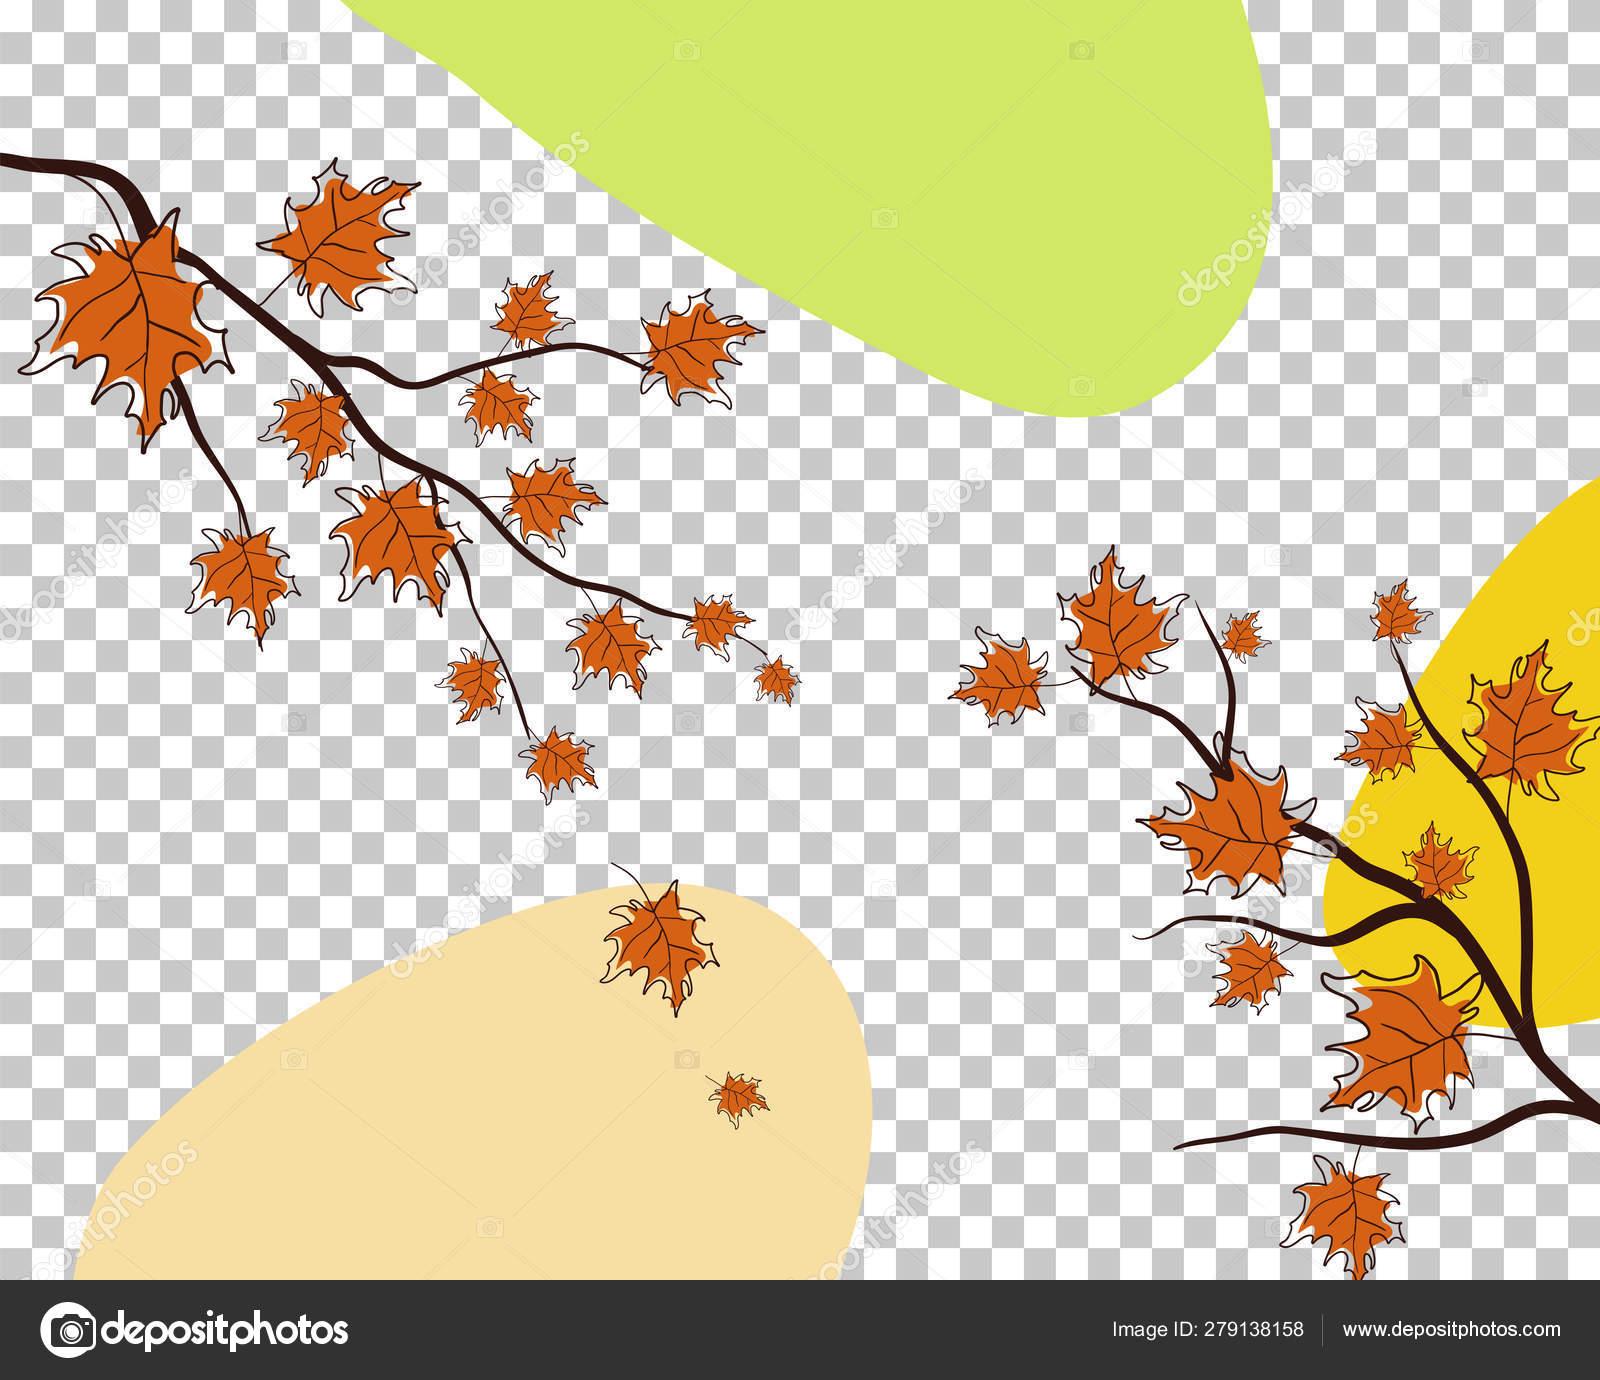 herfst wenskaart doodle stockvector c angelp 279138158 https depositphotos com nl 279138158 stock illustration autumn greeting doodle card html